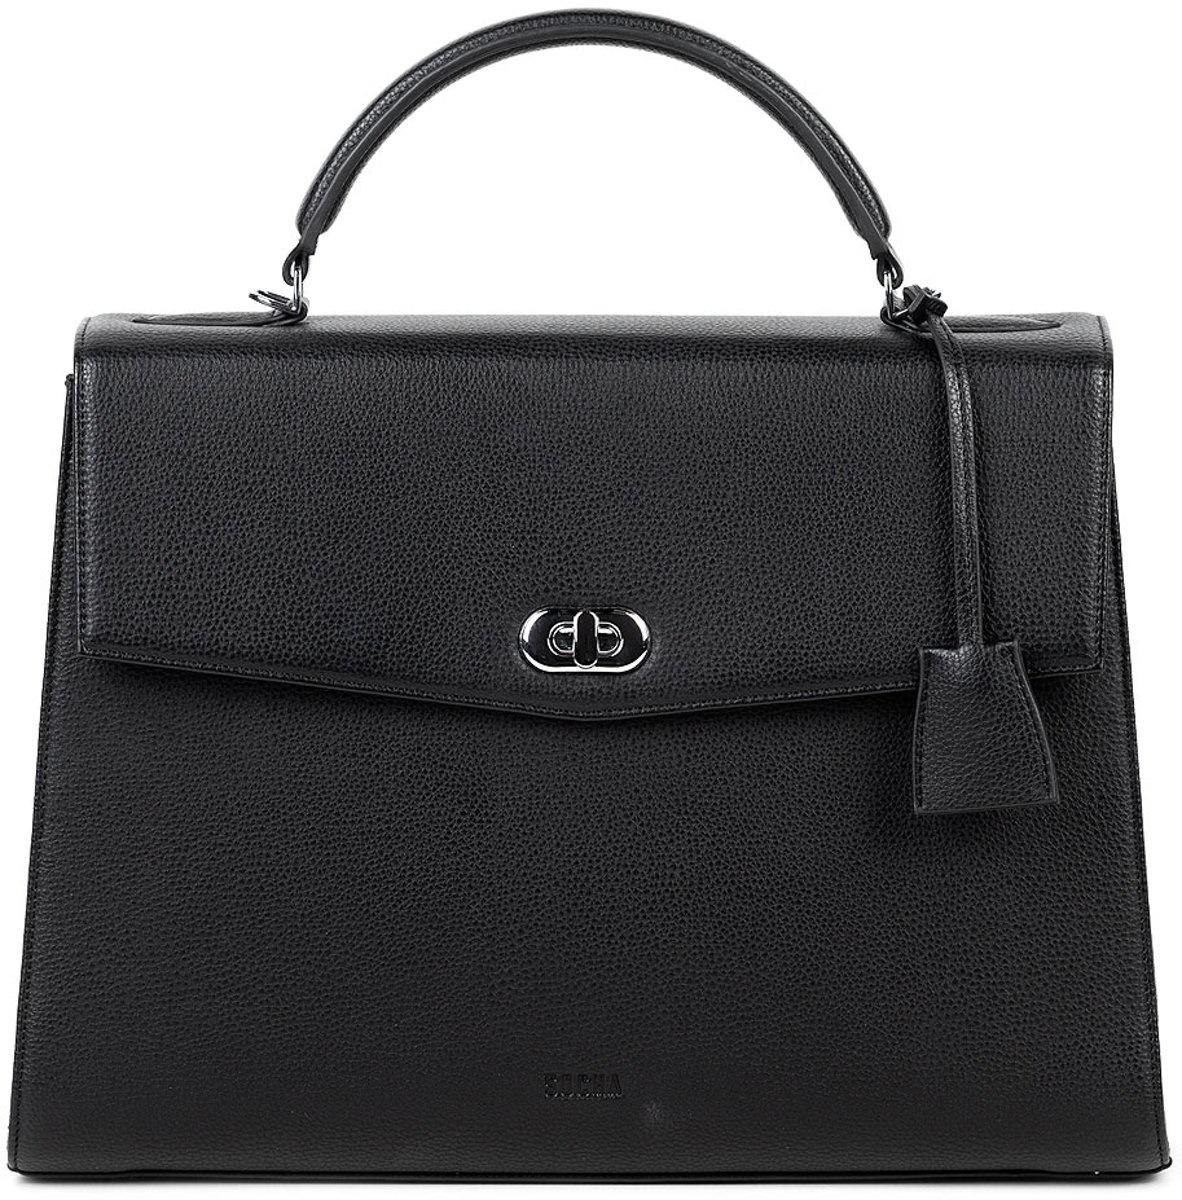 "Socha Socha Audrey Businessbag 13.3"" Black"